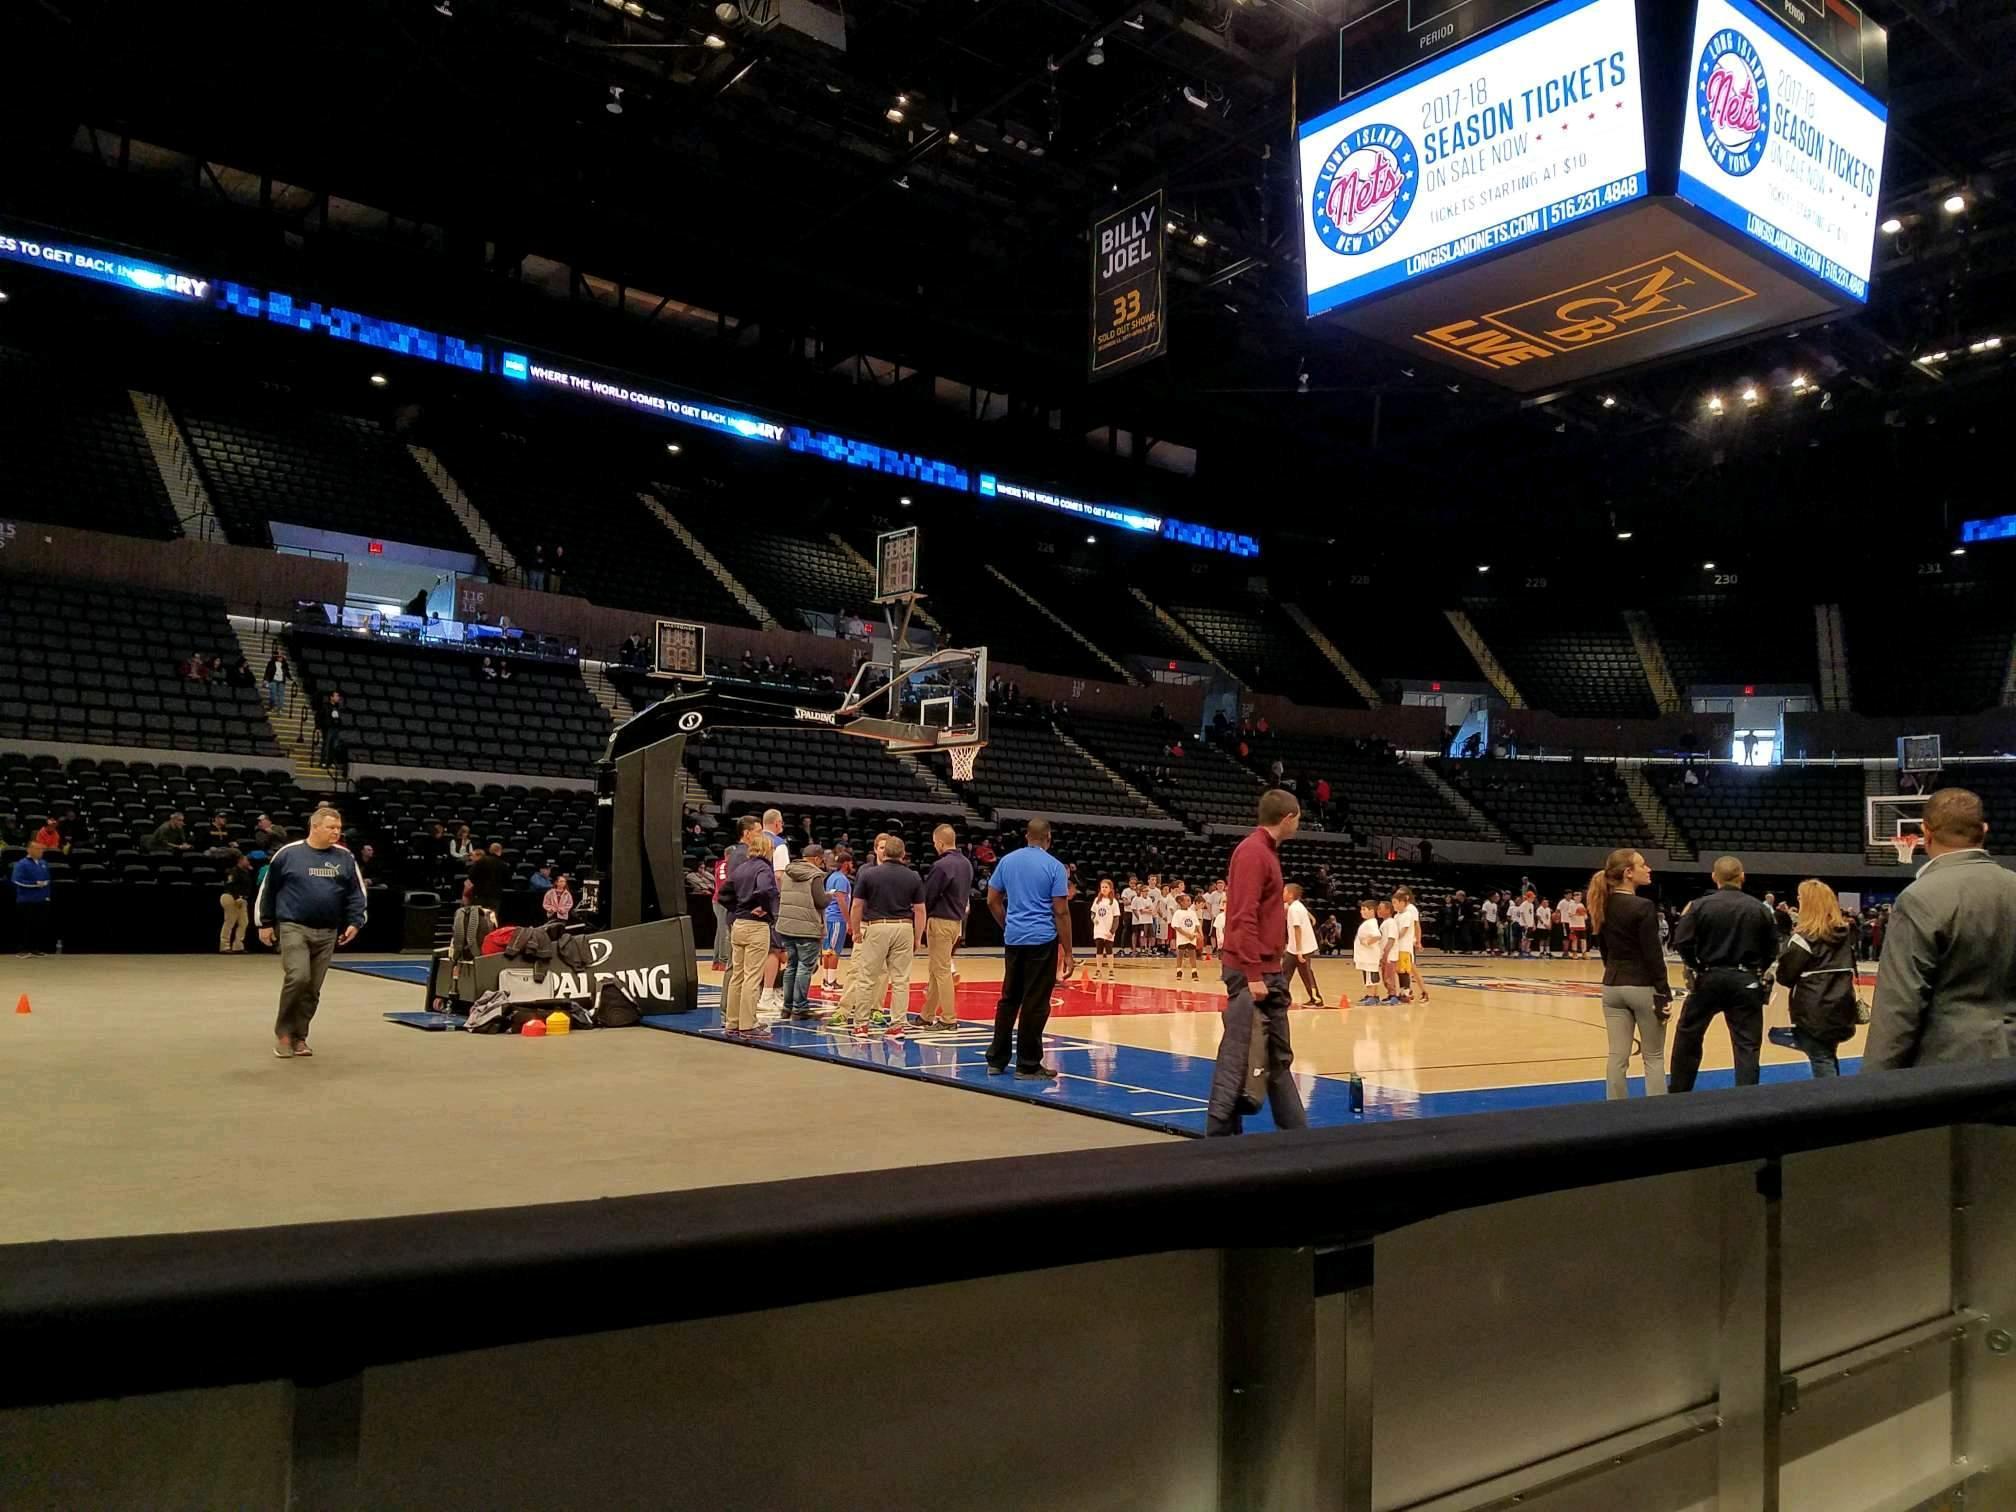 Nassau Veterans Memorial Coliseum Section 6 Row 1 Seat 3